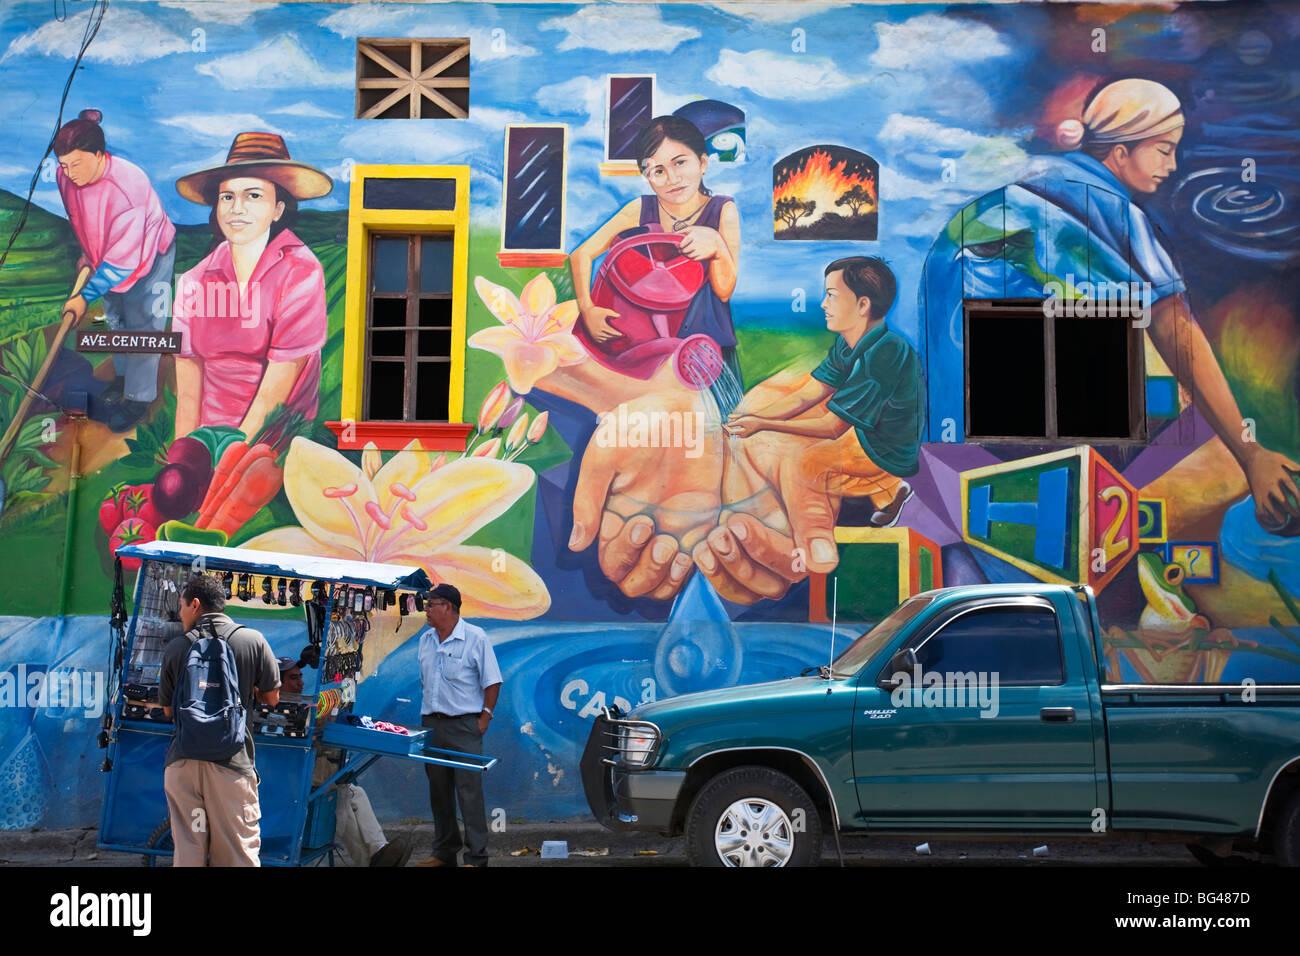 Nicaragua, Esteli, Wall mural - Stock Image